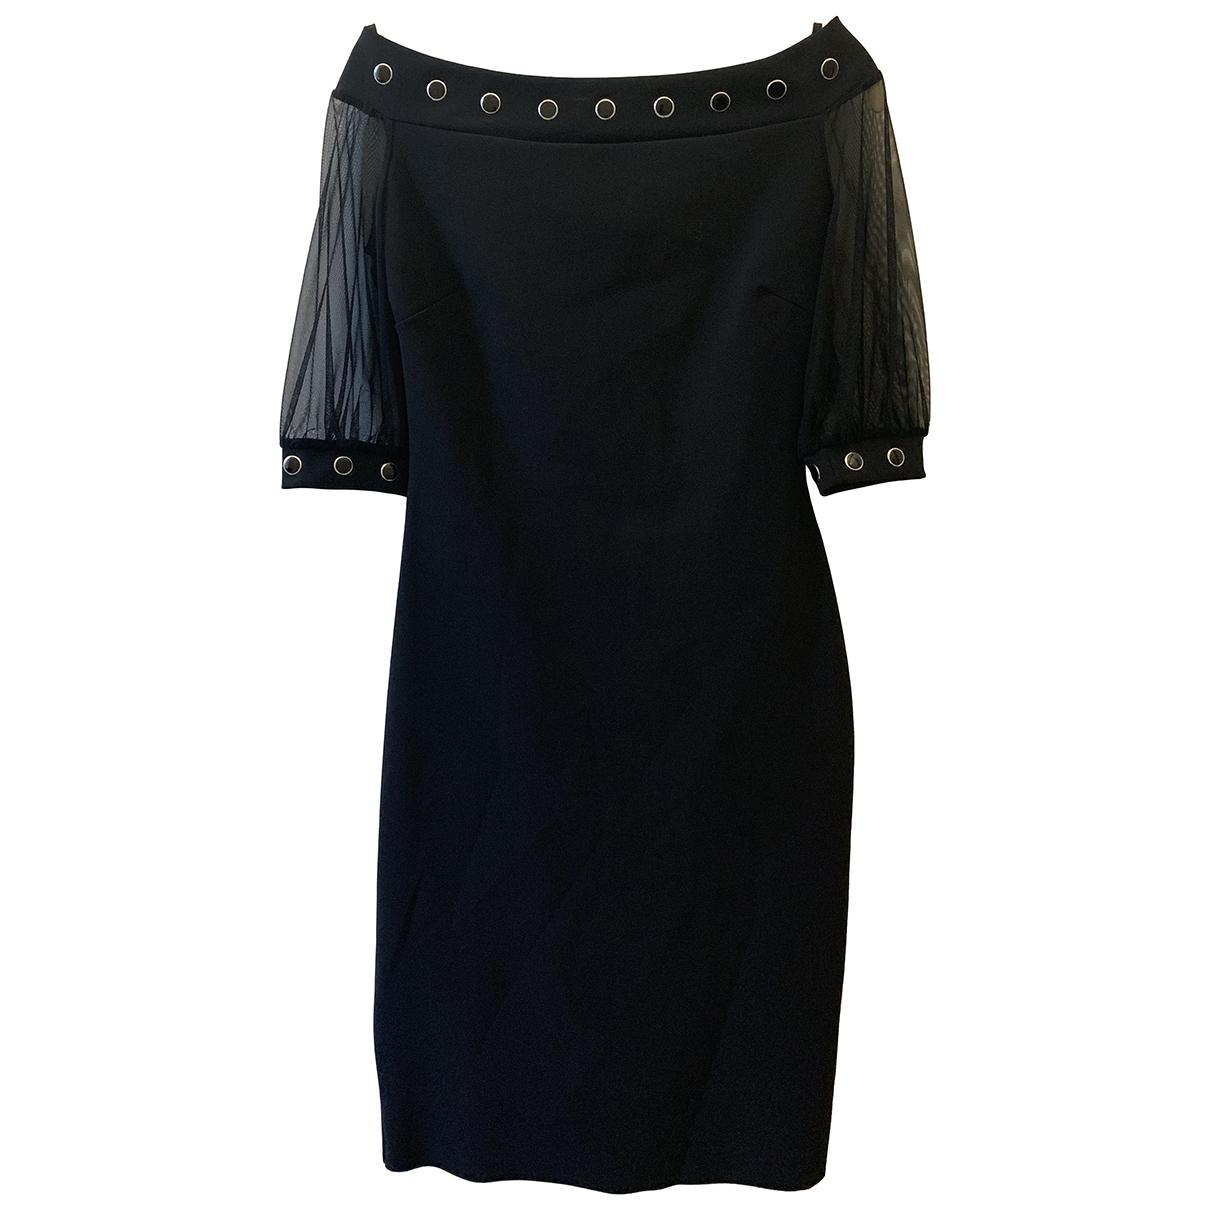 Chiara Boni - Robe   pour femme en coton - elasthane - noir